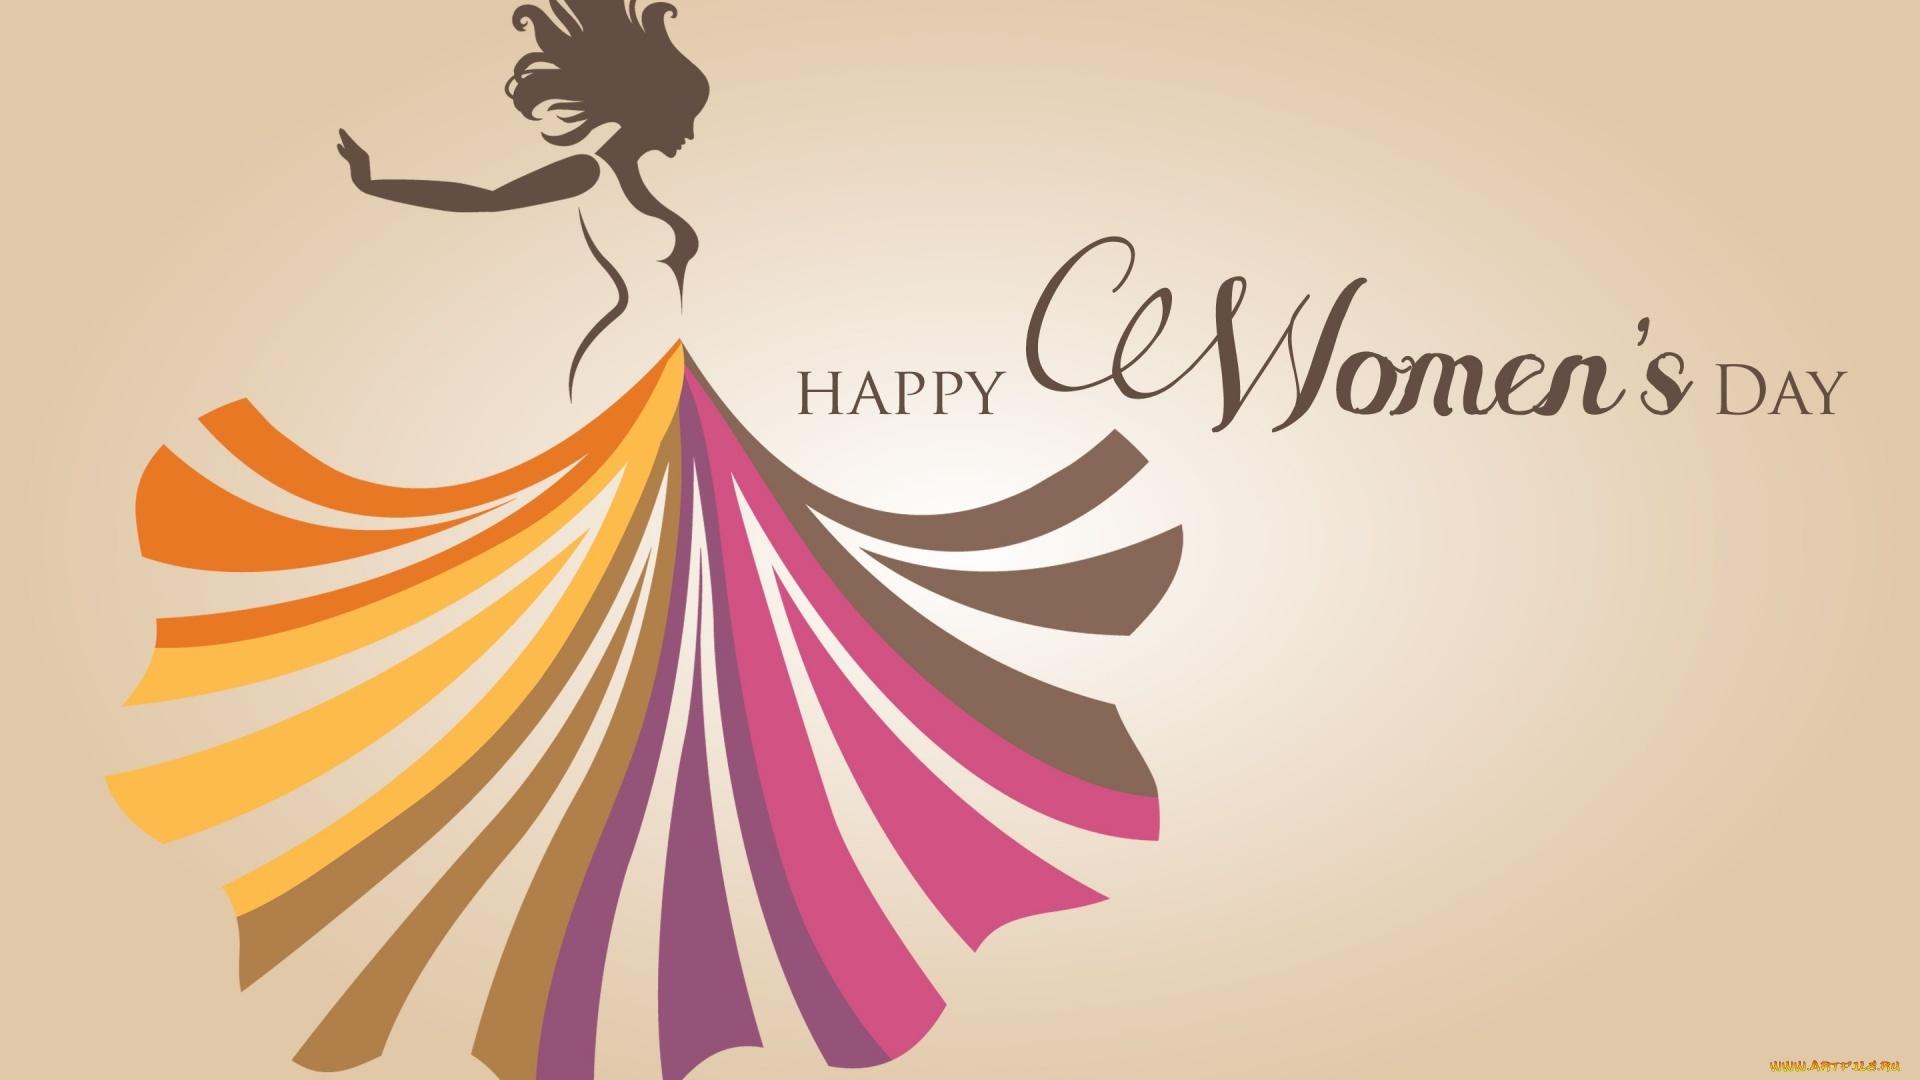 Happy Women's Day Desktop Wallpaper